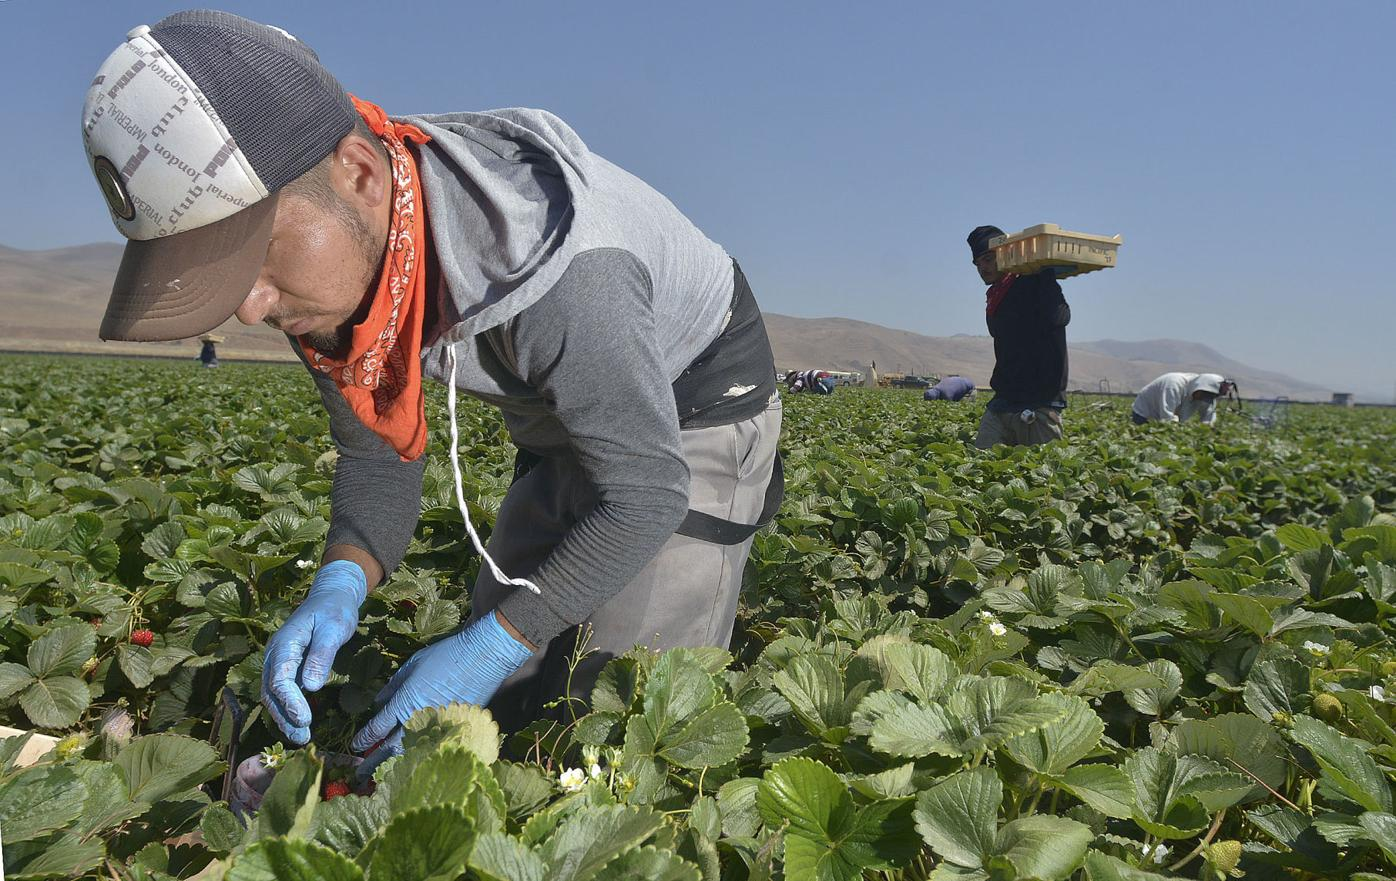 080516 H2A farmworkers 01.jpg